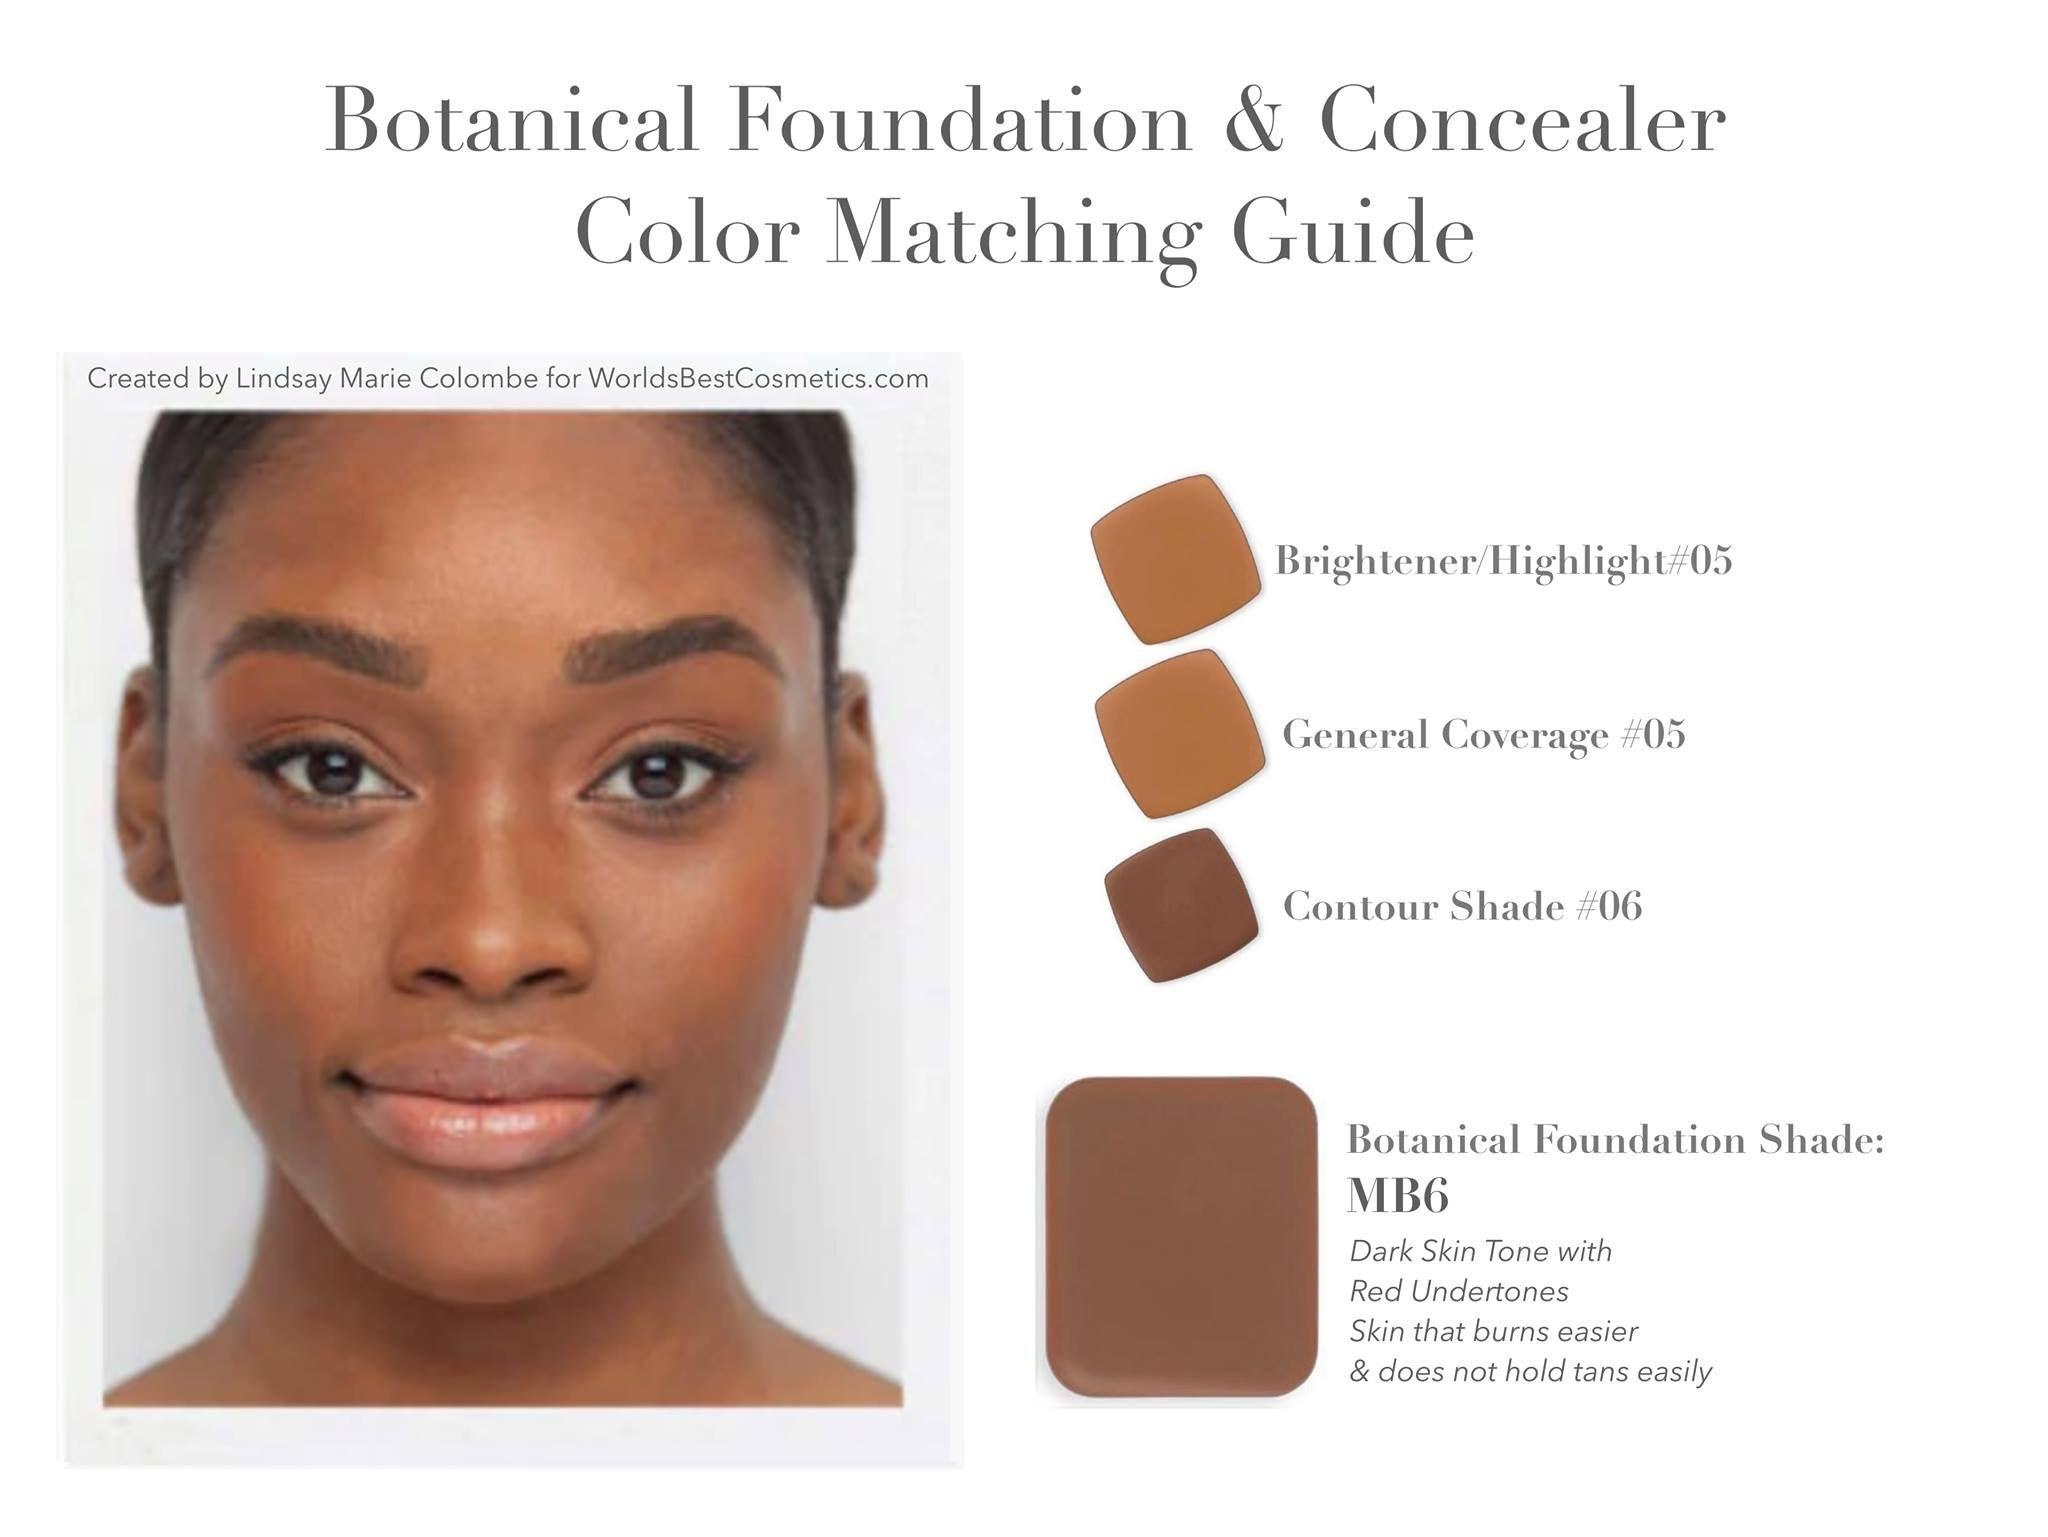 LimeLife foundation color matching help Botanical